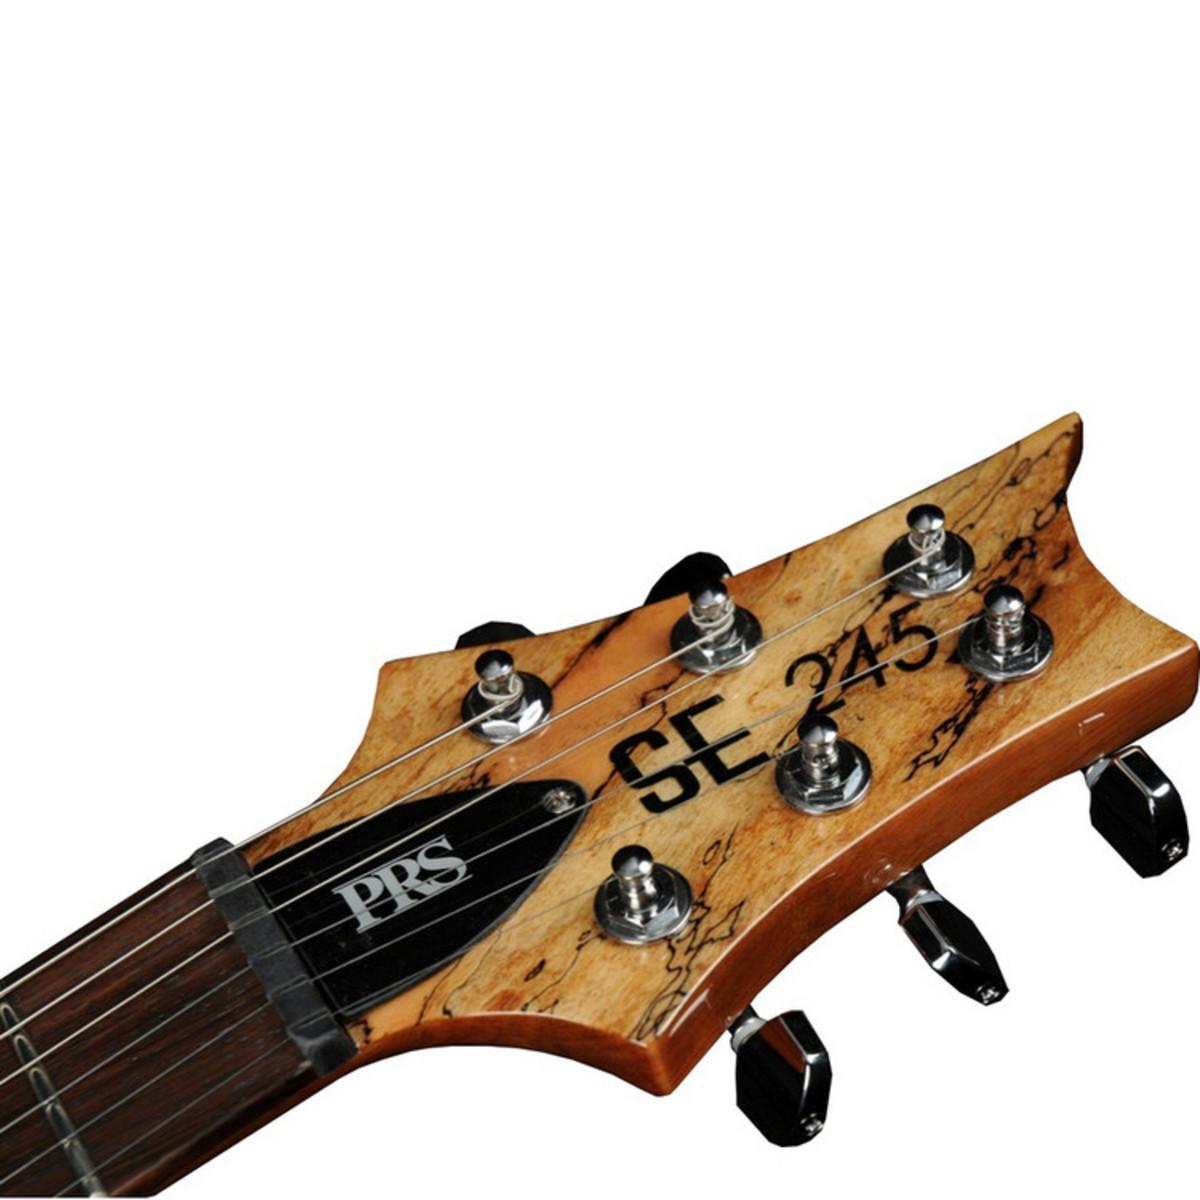 disc prs se singlecut 245 electric guitar natural spalted maple at. Black Bedroom Furniture Sets. Home Design Ideas